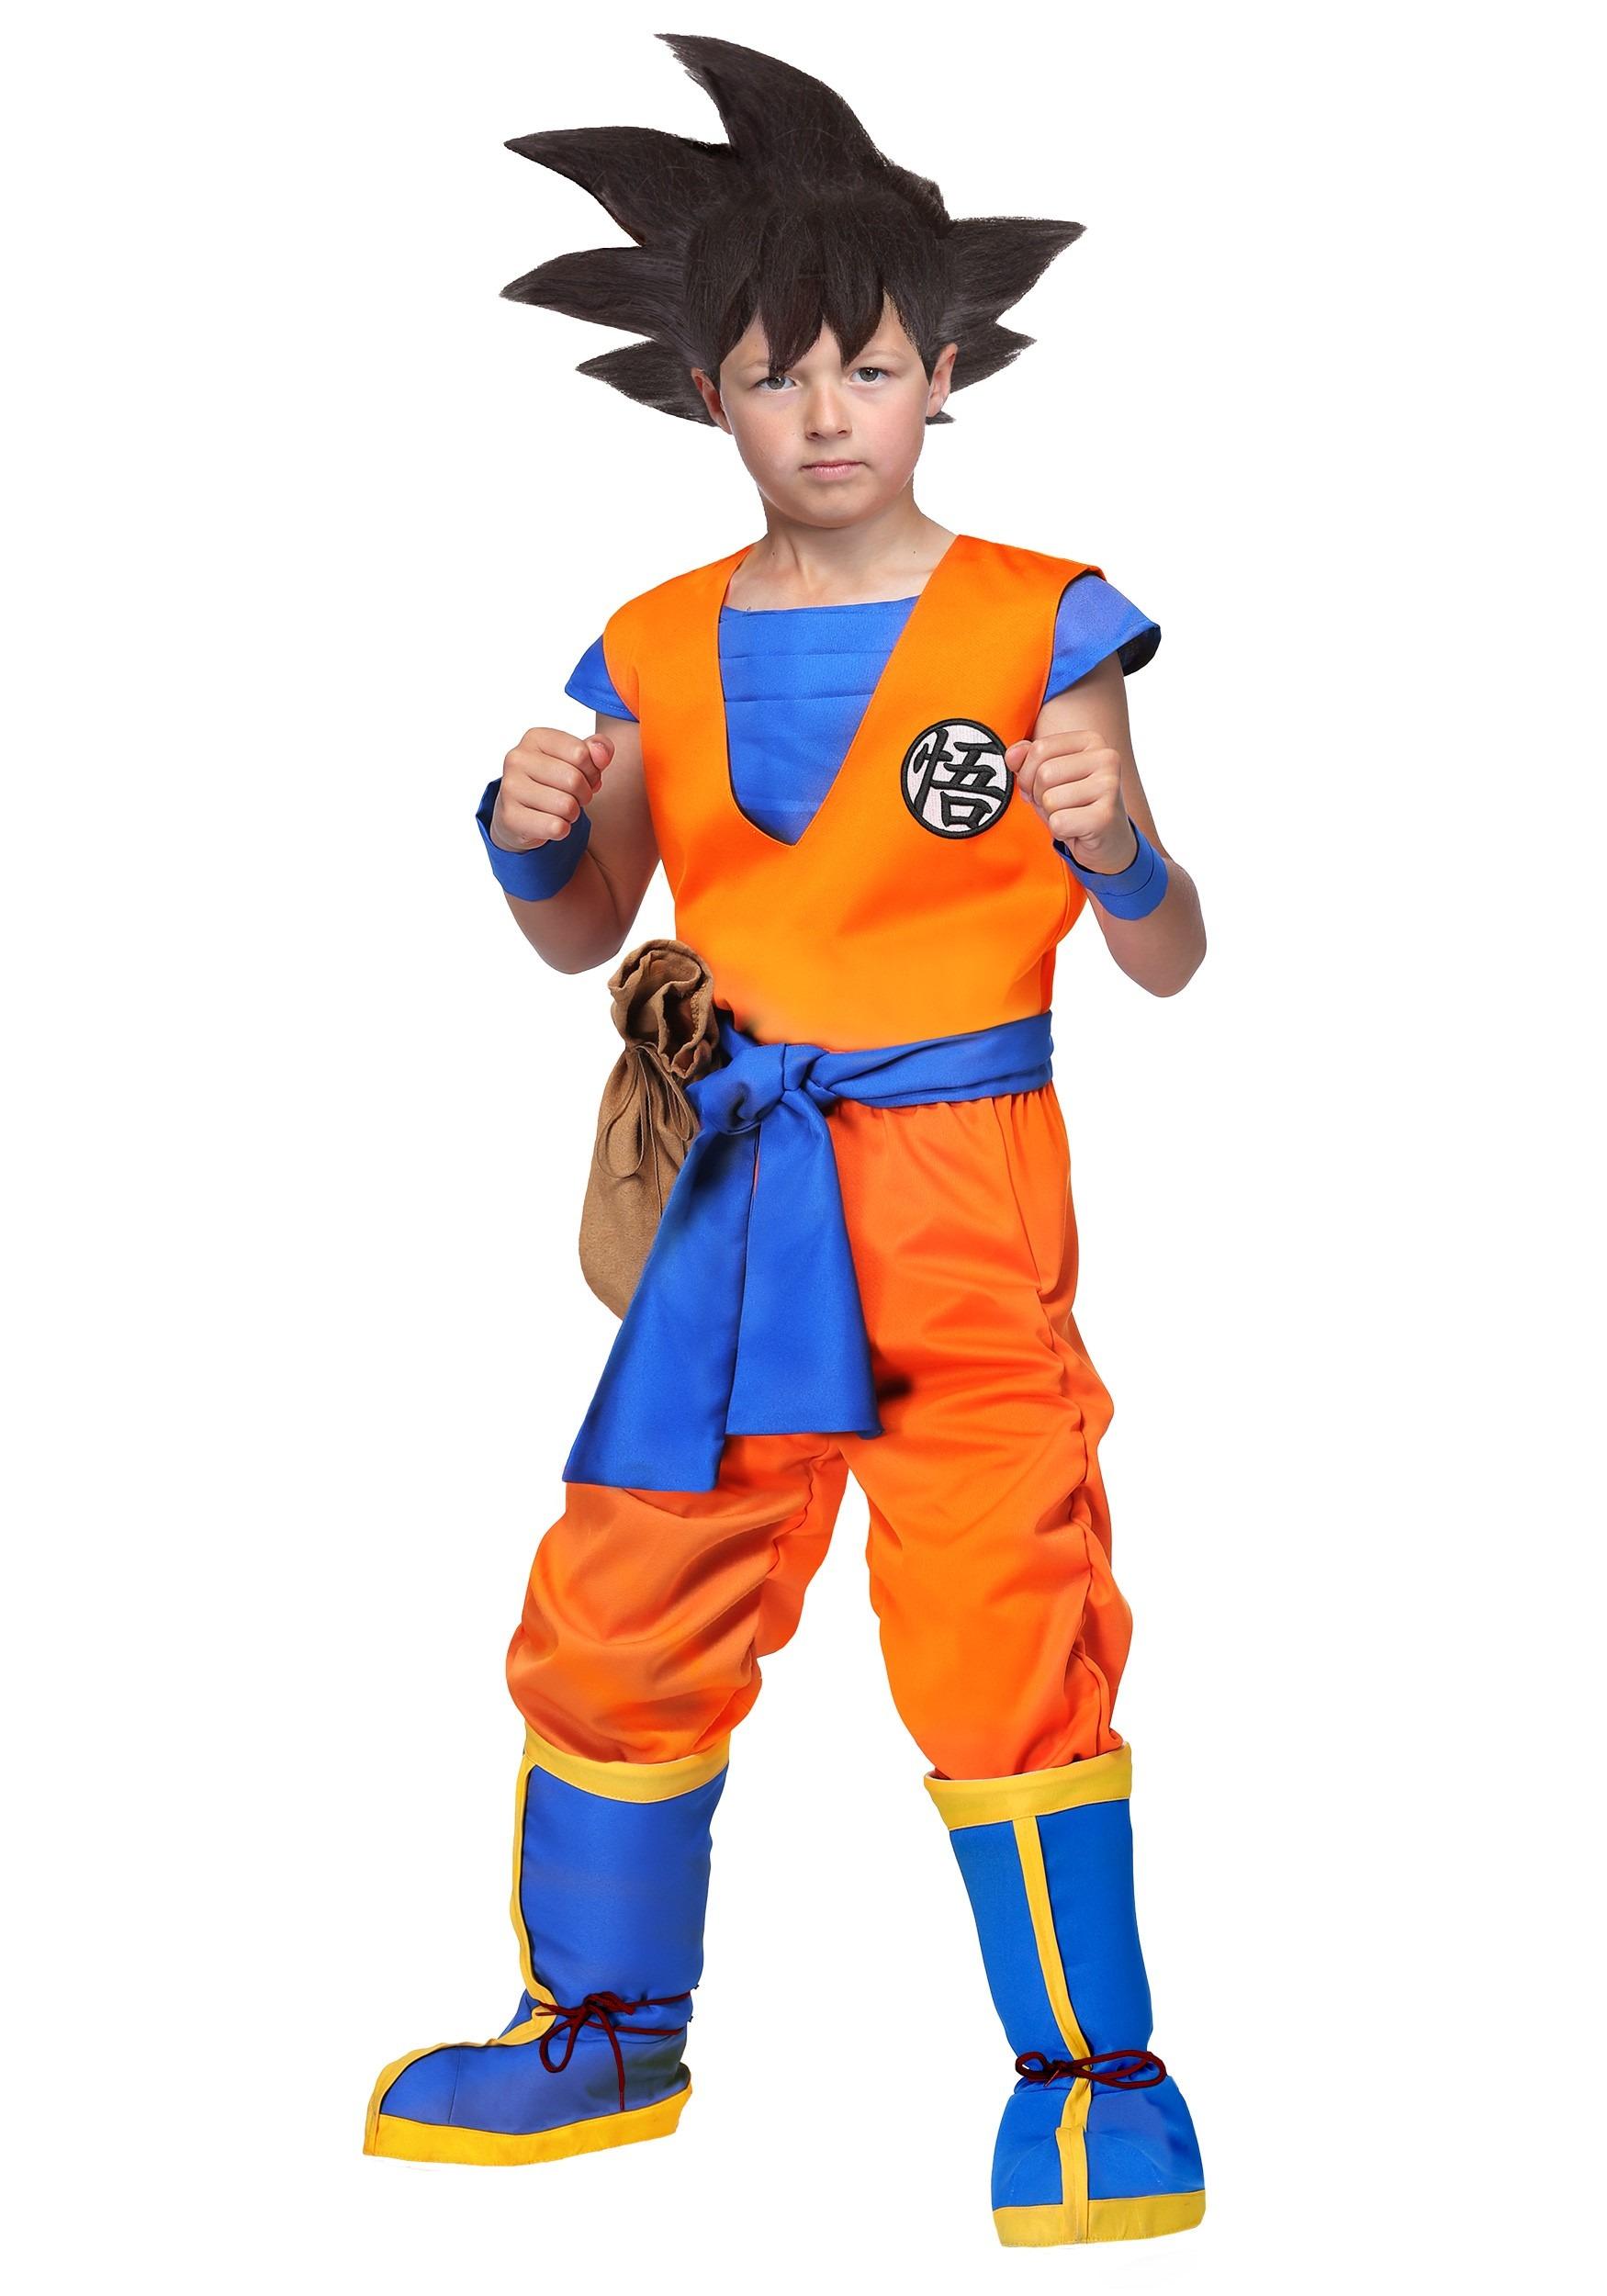 Authentic Dragon Ball Z Goku Costume for Kids